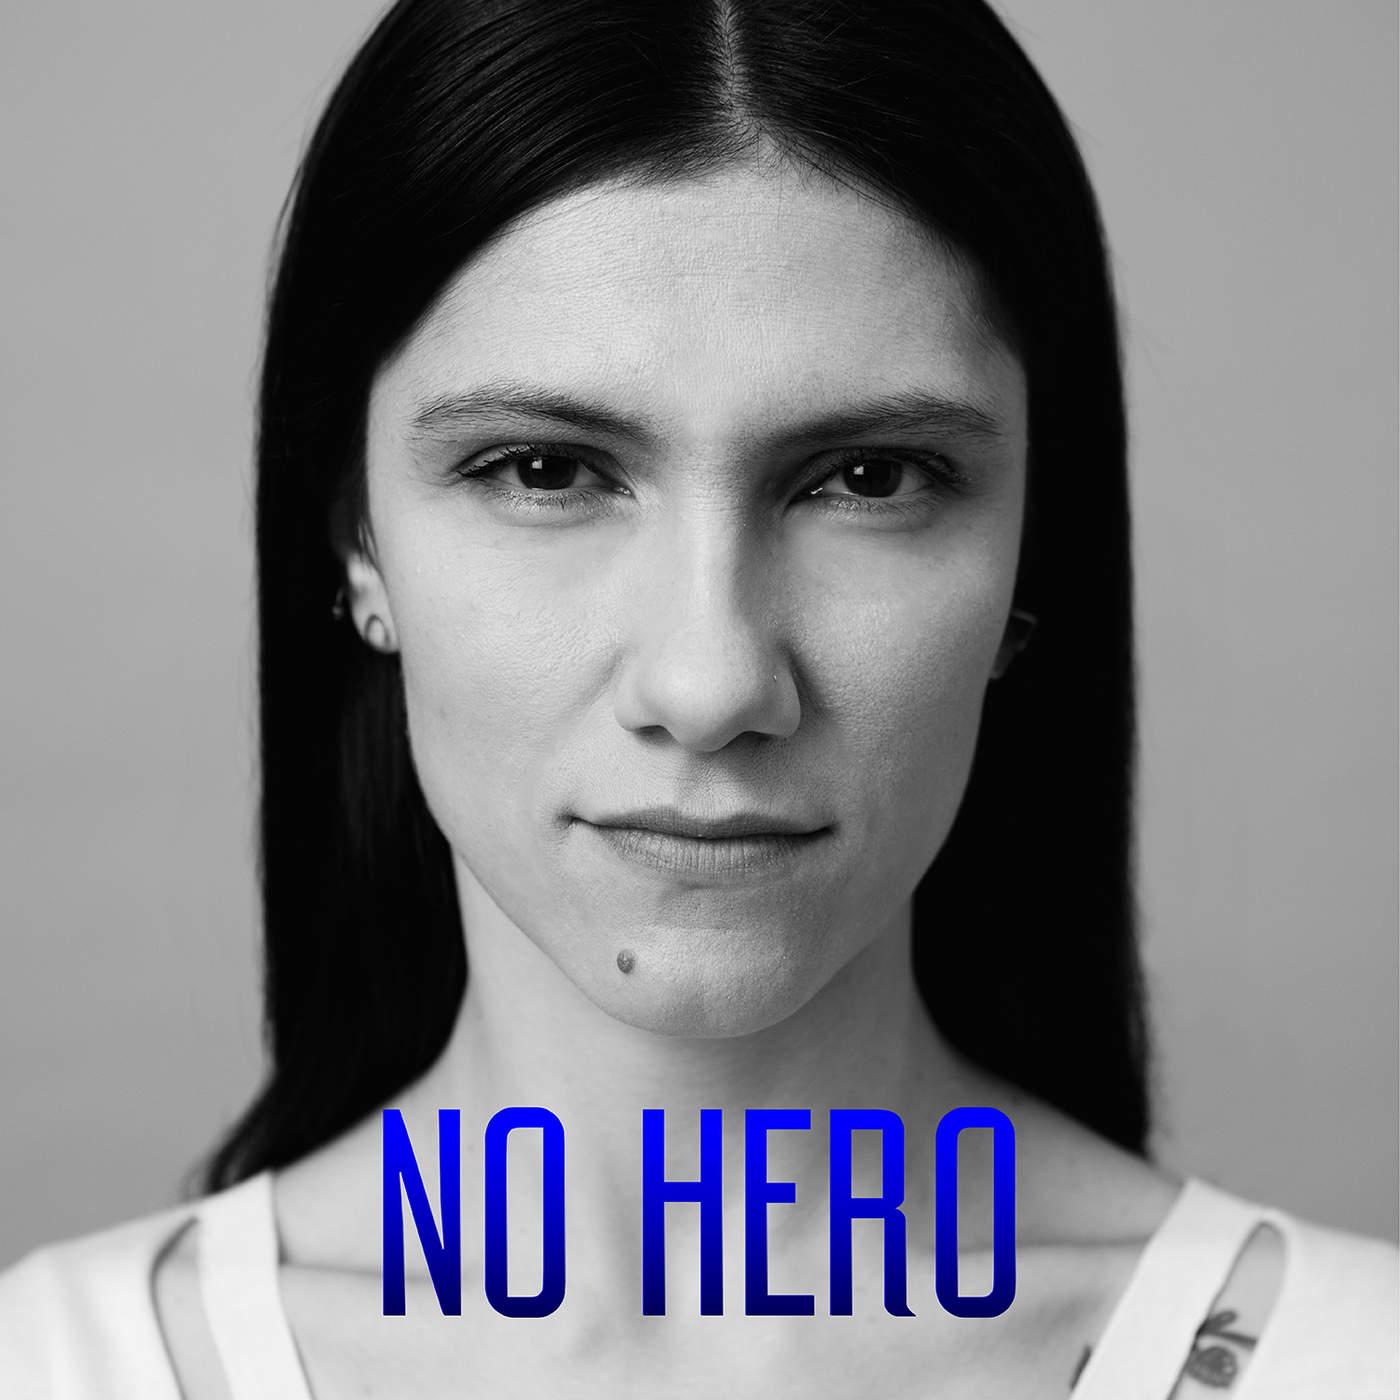 Elisa - No Hero (Bonus Track)(iTunes)(2016).mp4 1080p AAC - Eng